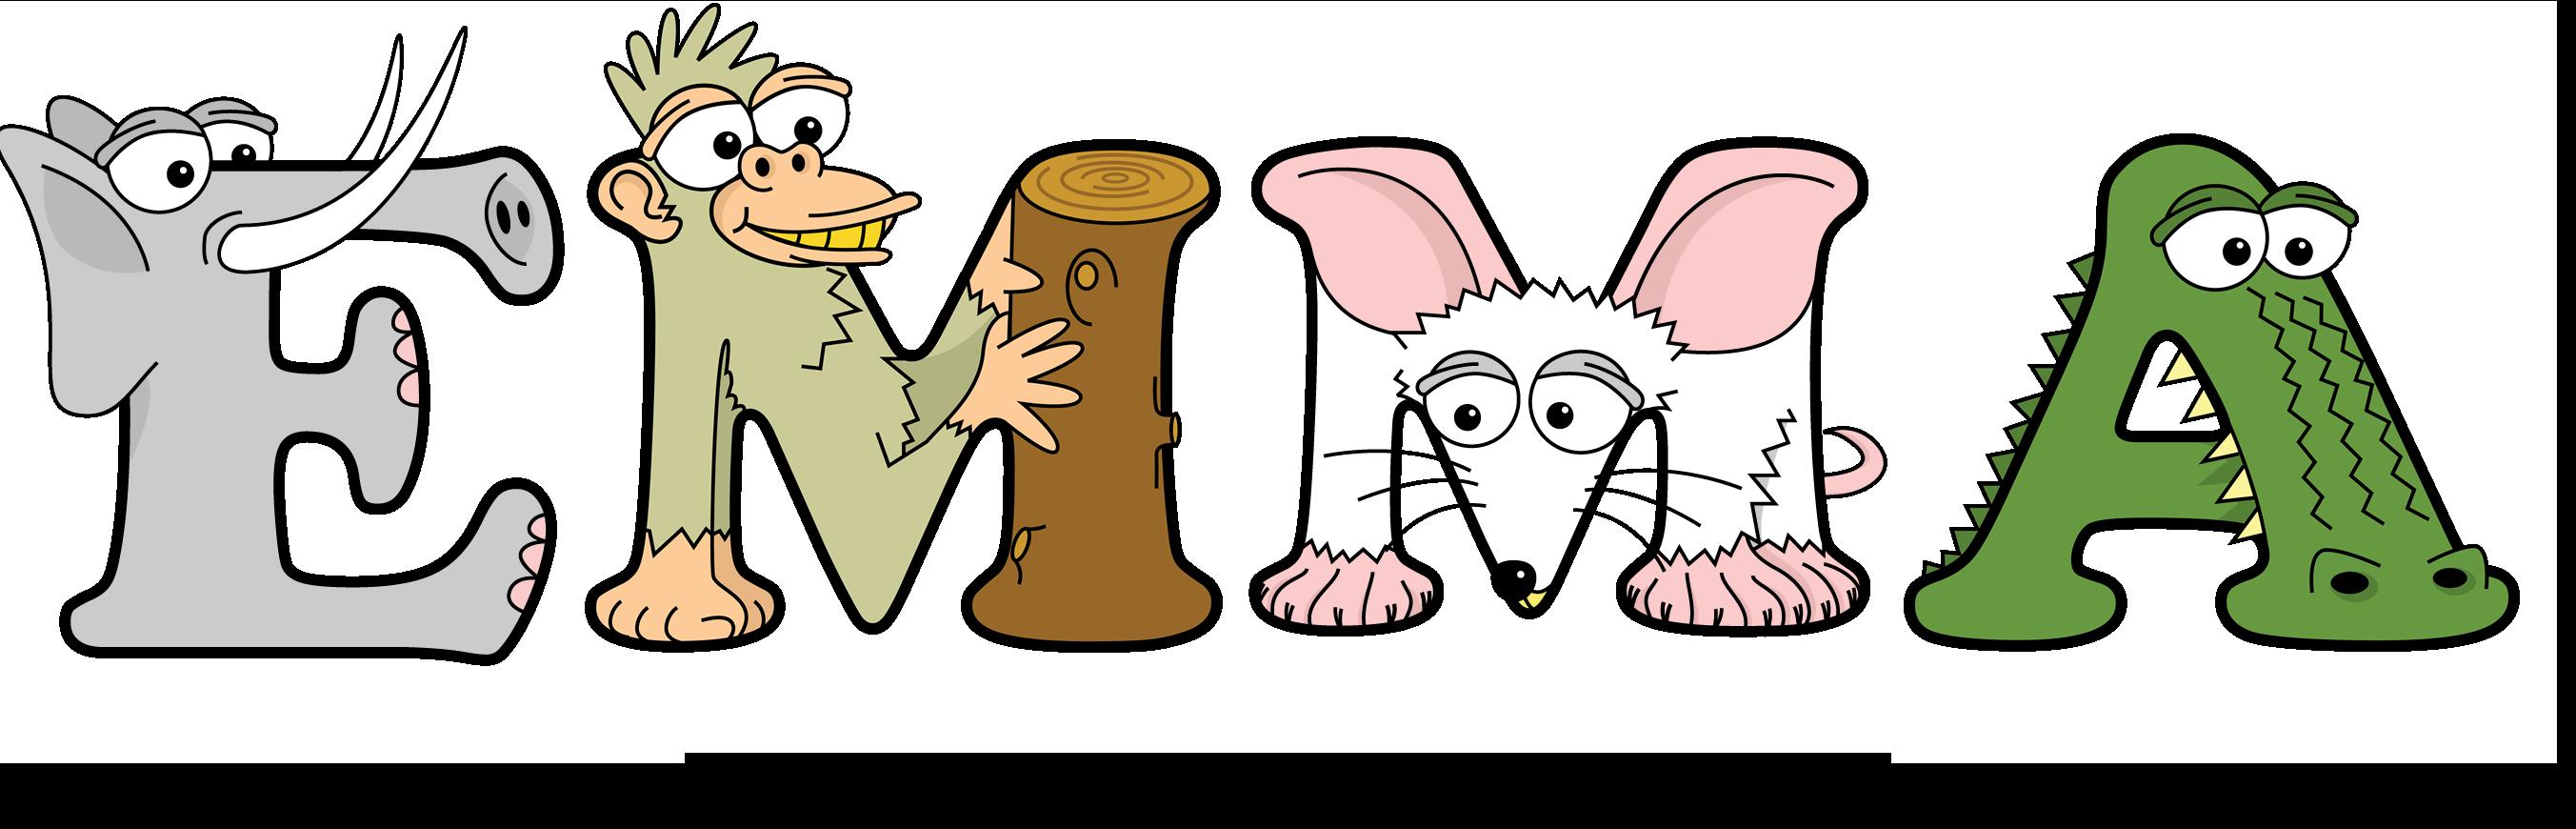 The word EMMA written in cute cartoon animal drawings